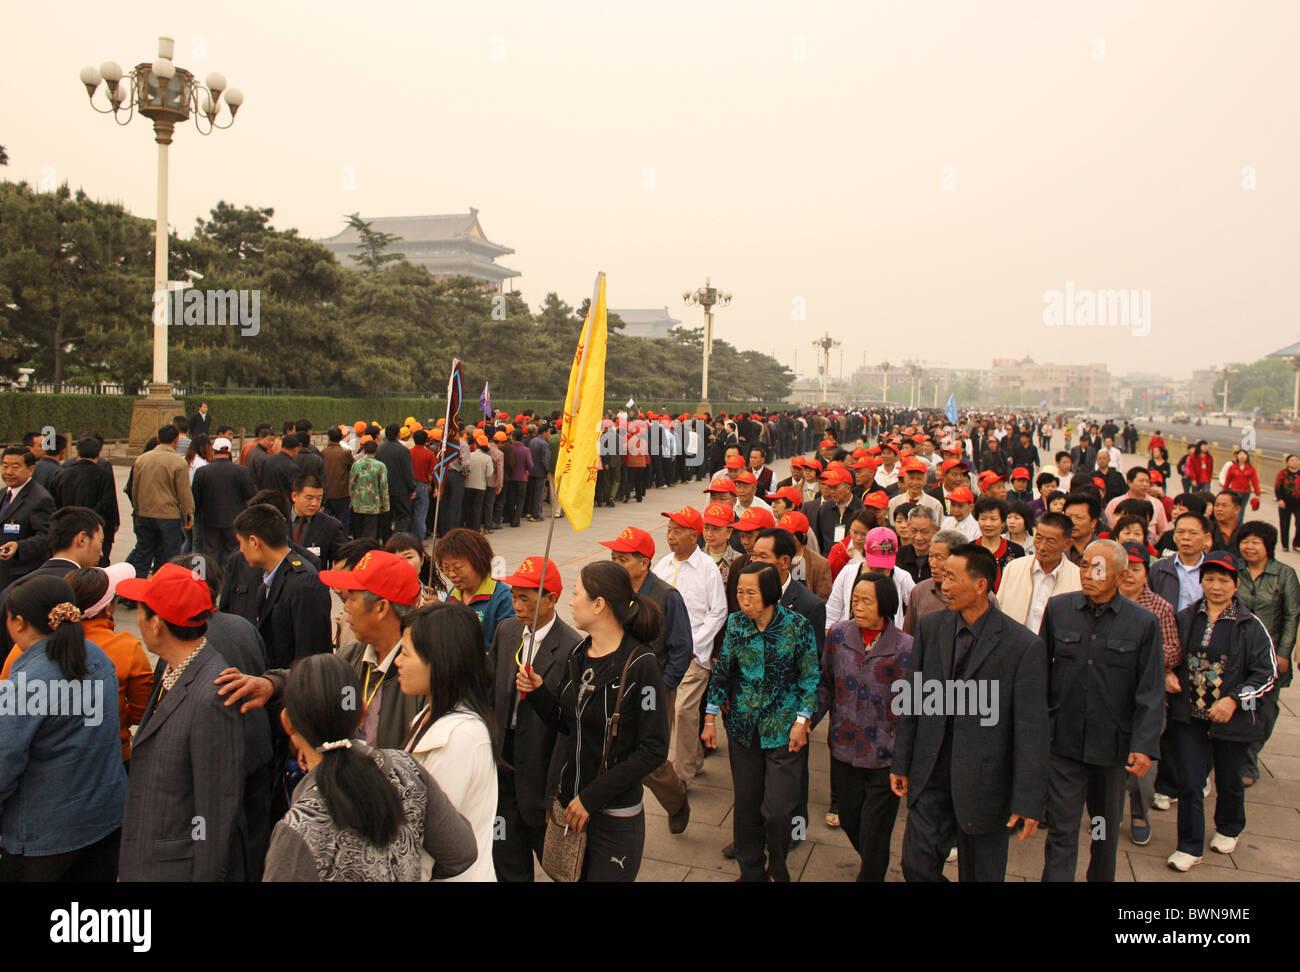 China Asia Peking Beijing Beijing Tian'anmen April 2008 Tiananmen Gate party group parties groups Chinese - Stock Image